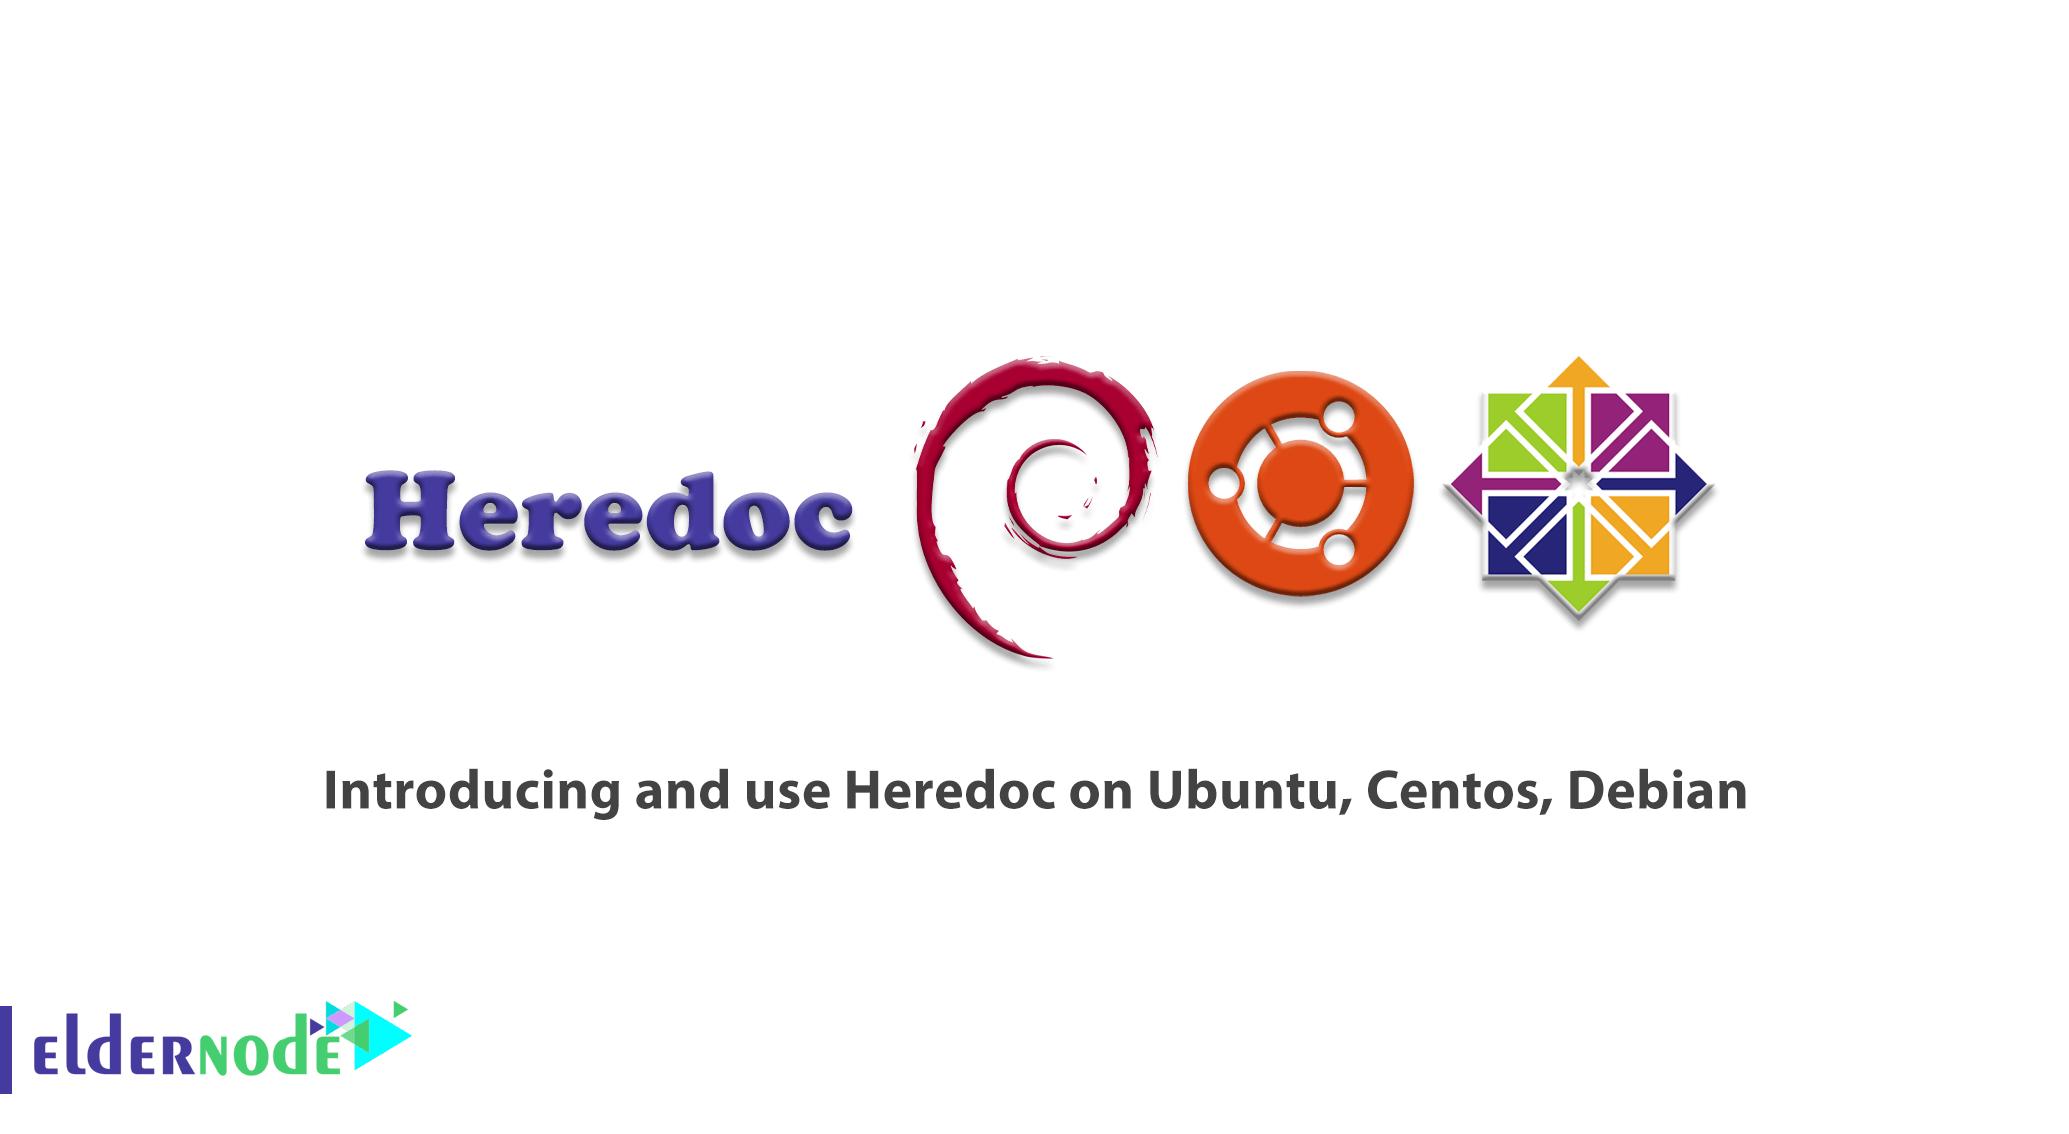 Introducing and use Heredoc on Ubuntu, Centos, Debian